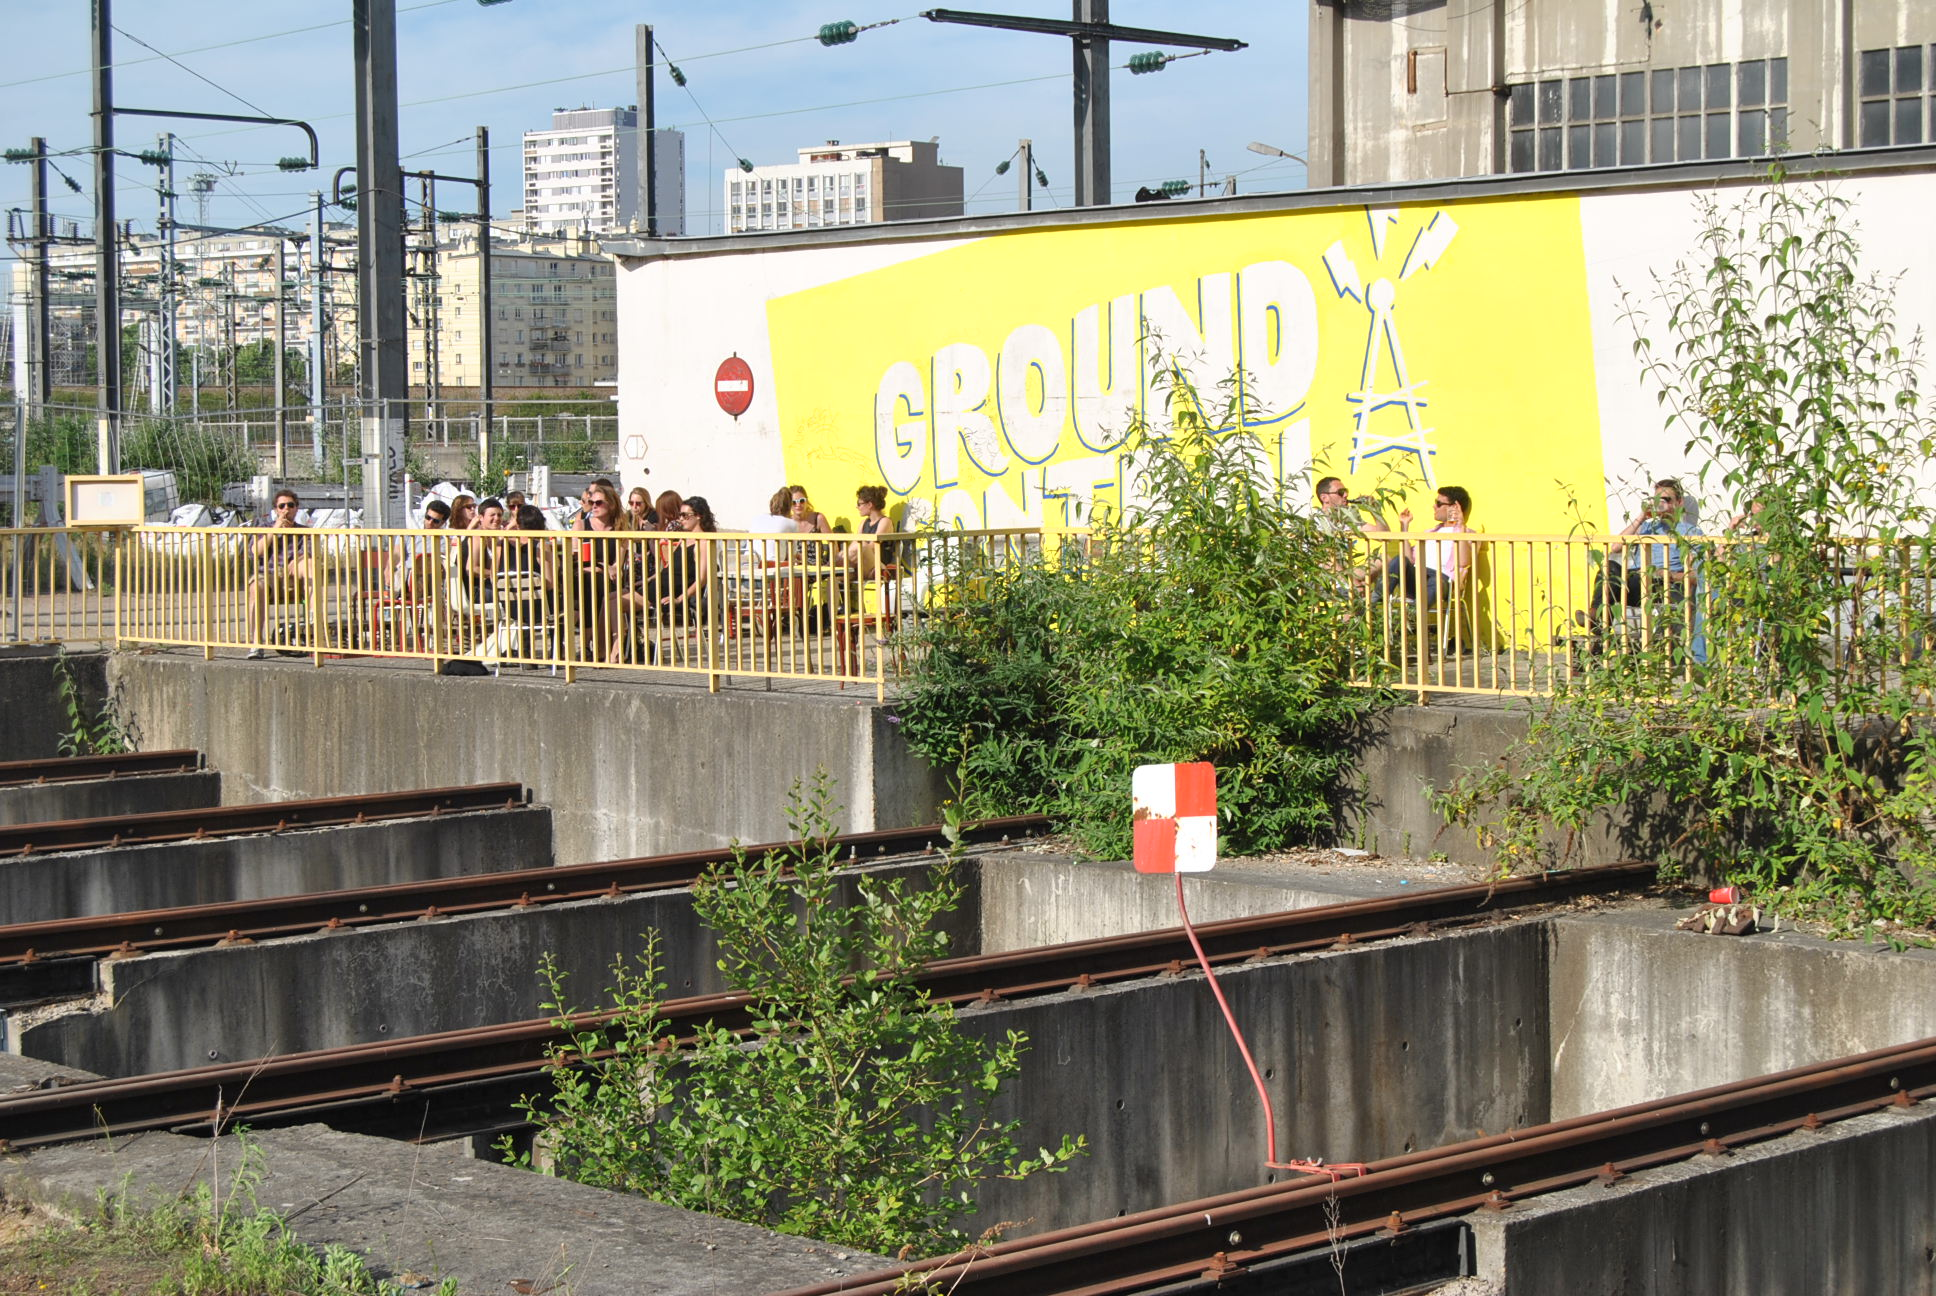 ground control yellow sign paris